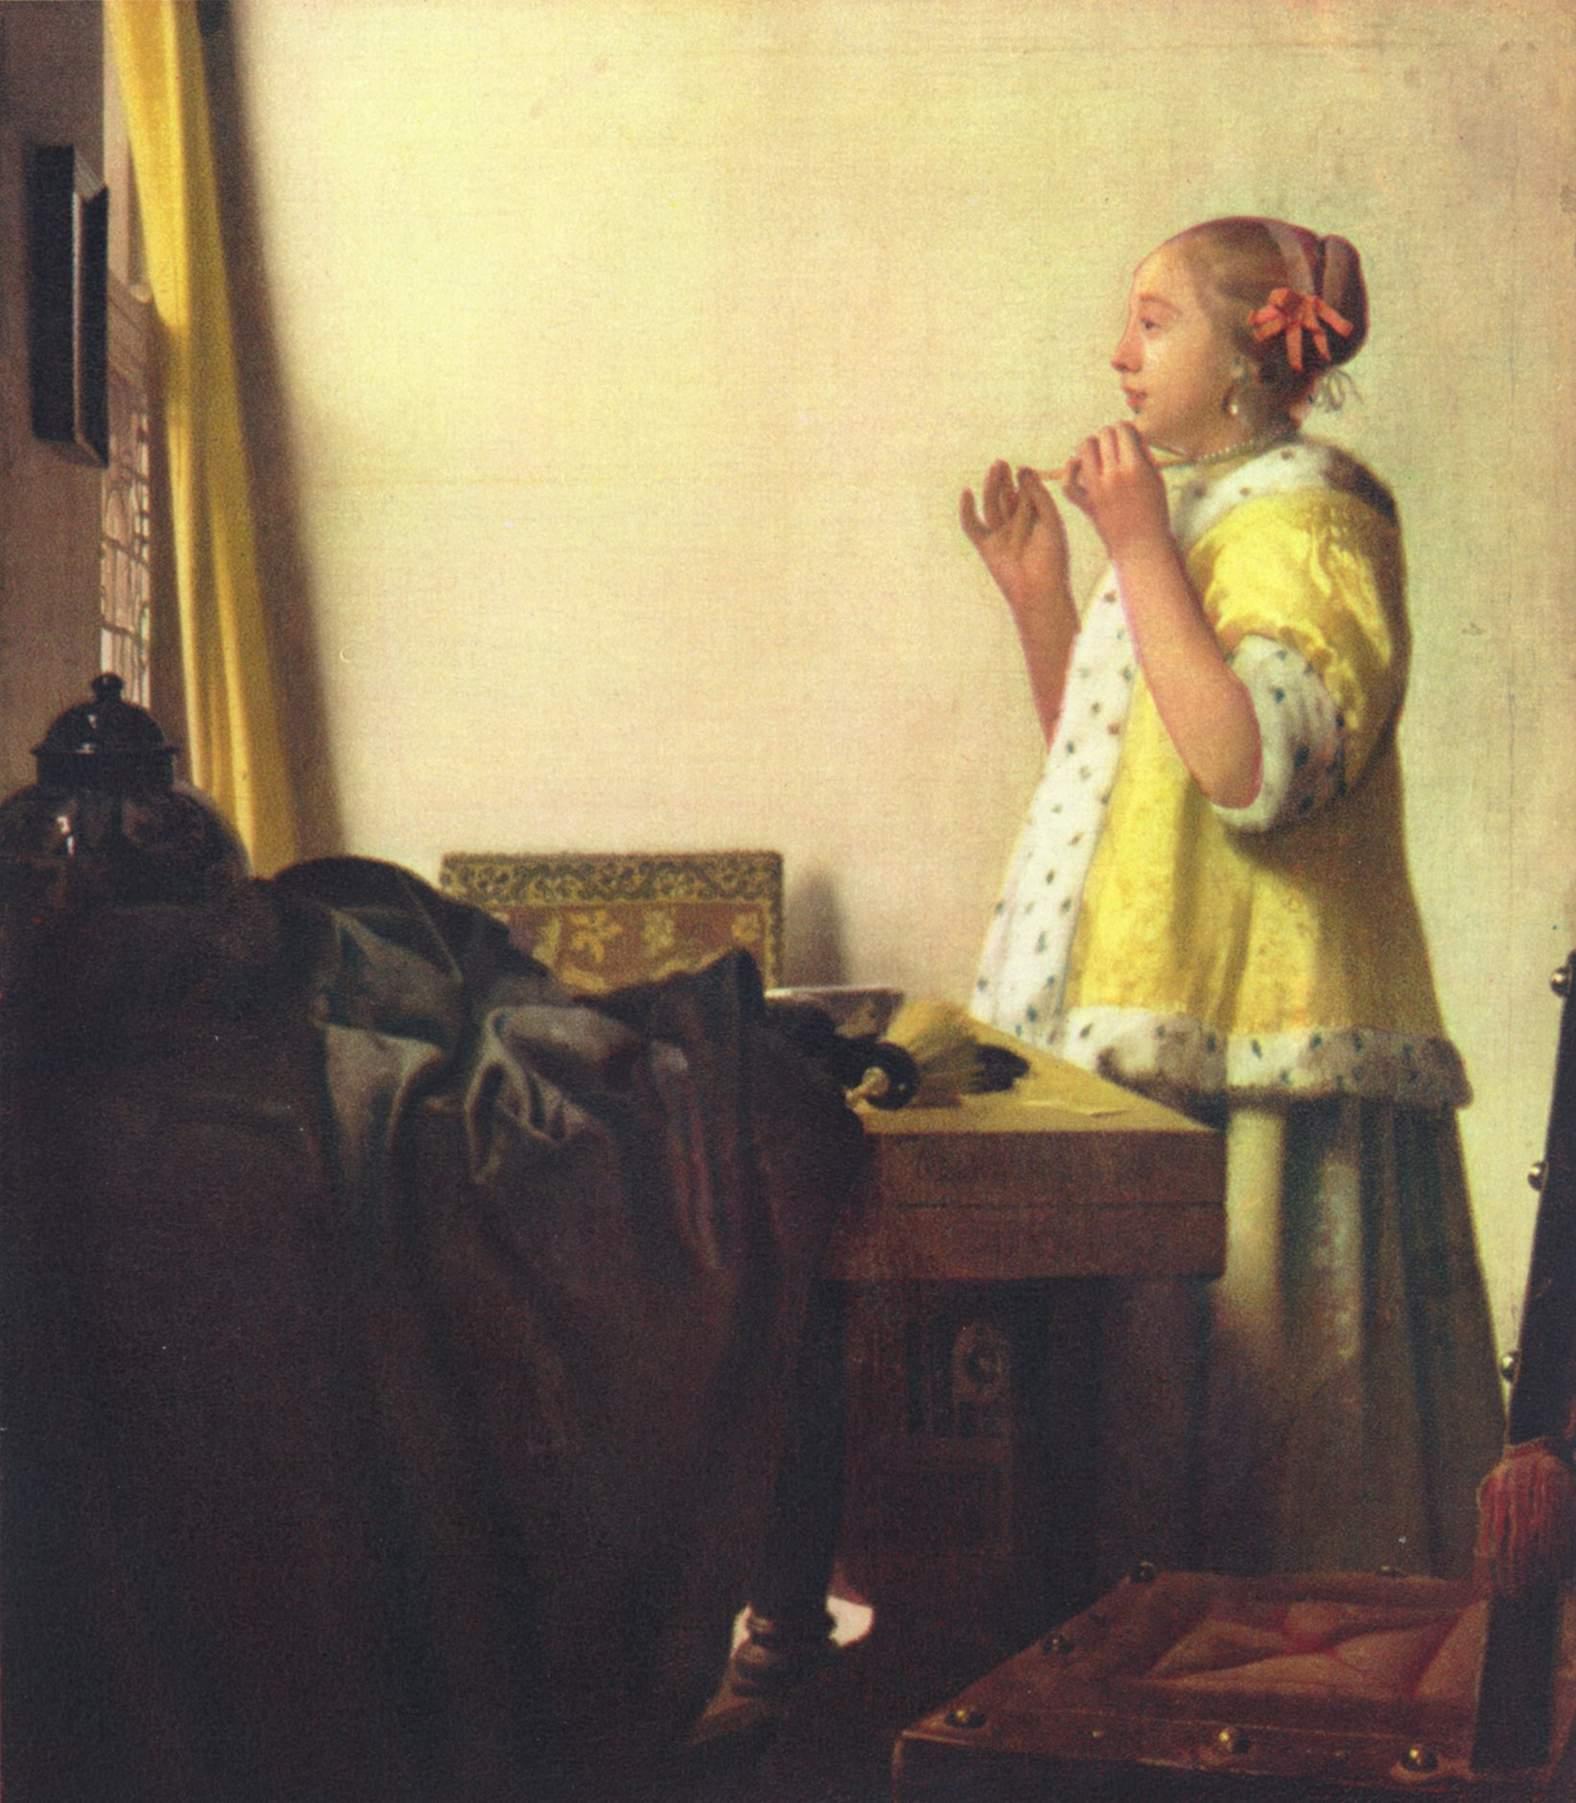 <img200*0:http://upload.wikimedia.org/wikipedia/commons/0/09/Jan_Vermeer_van_Delft_008.jpg>